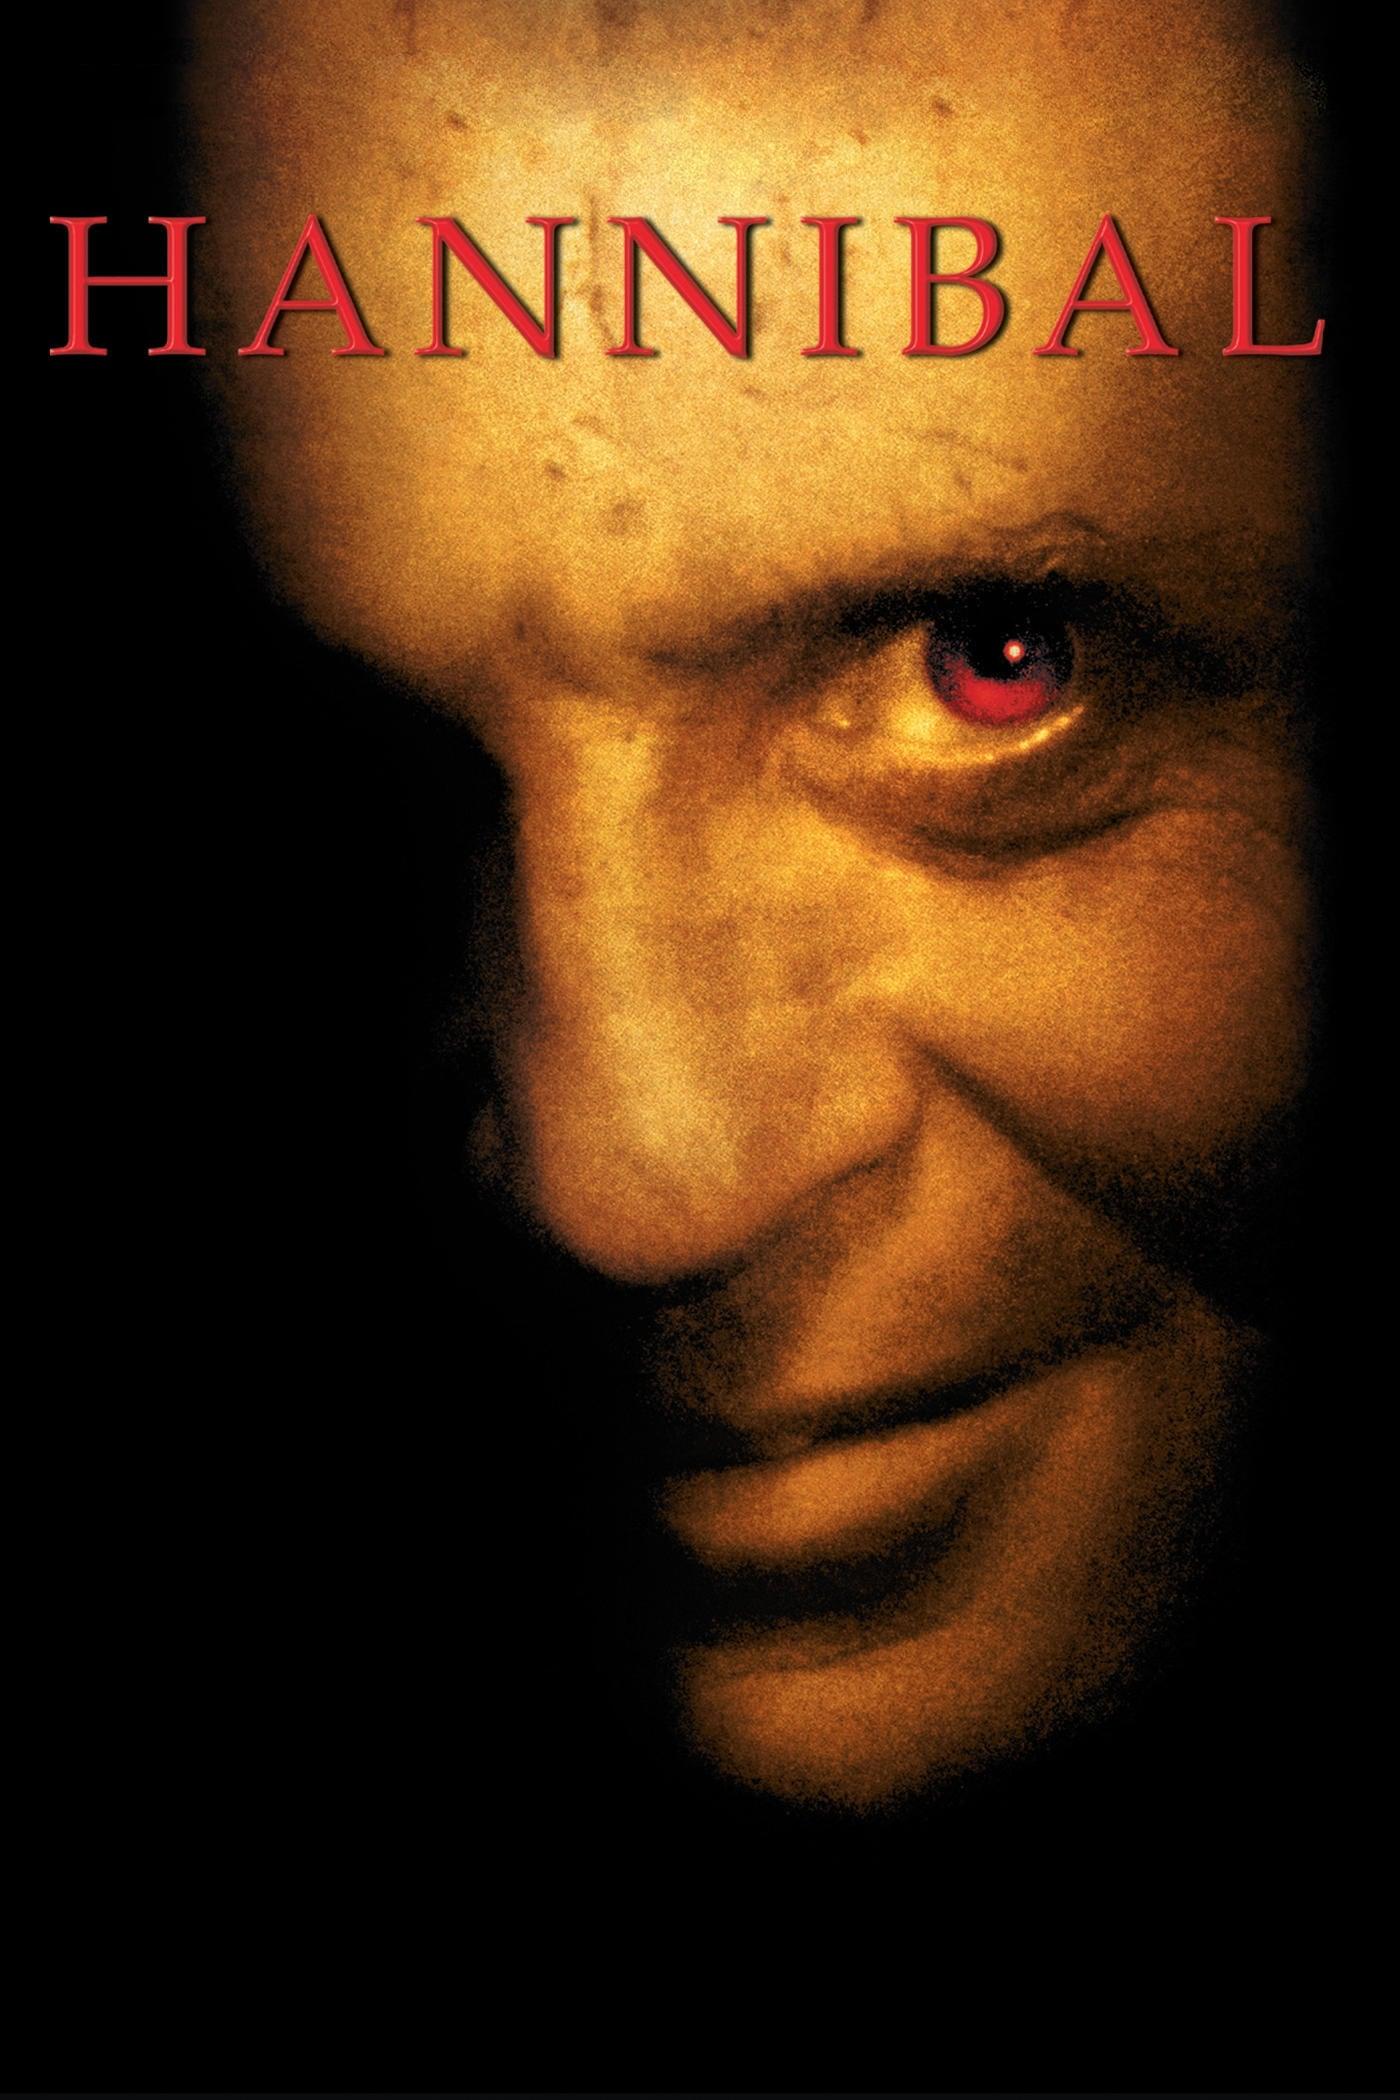 Hannibal Película Completa HD 1080p [MEGA] [LATINO] 2001